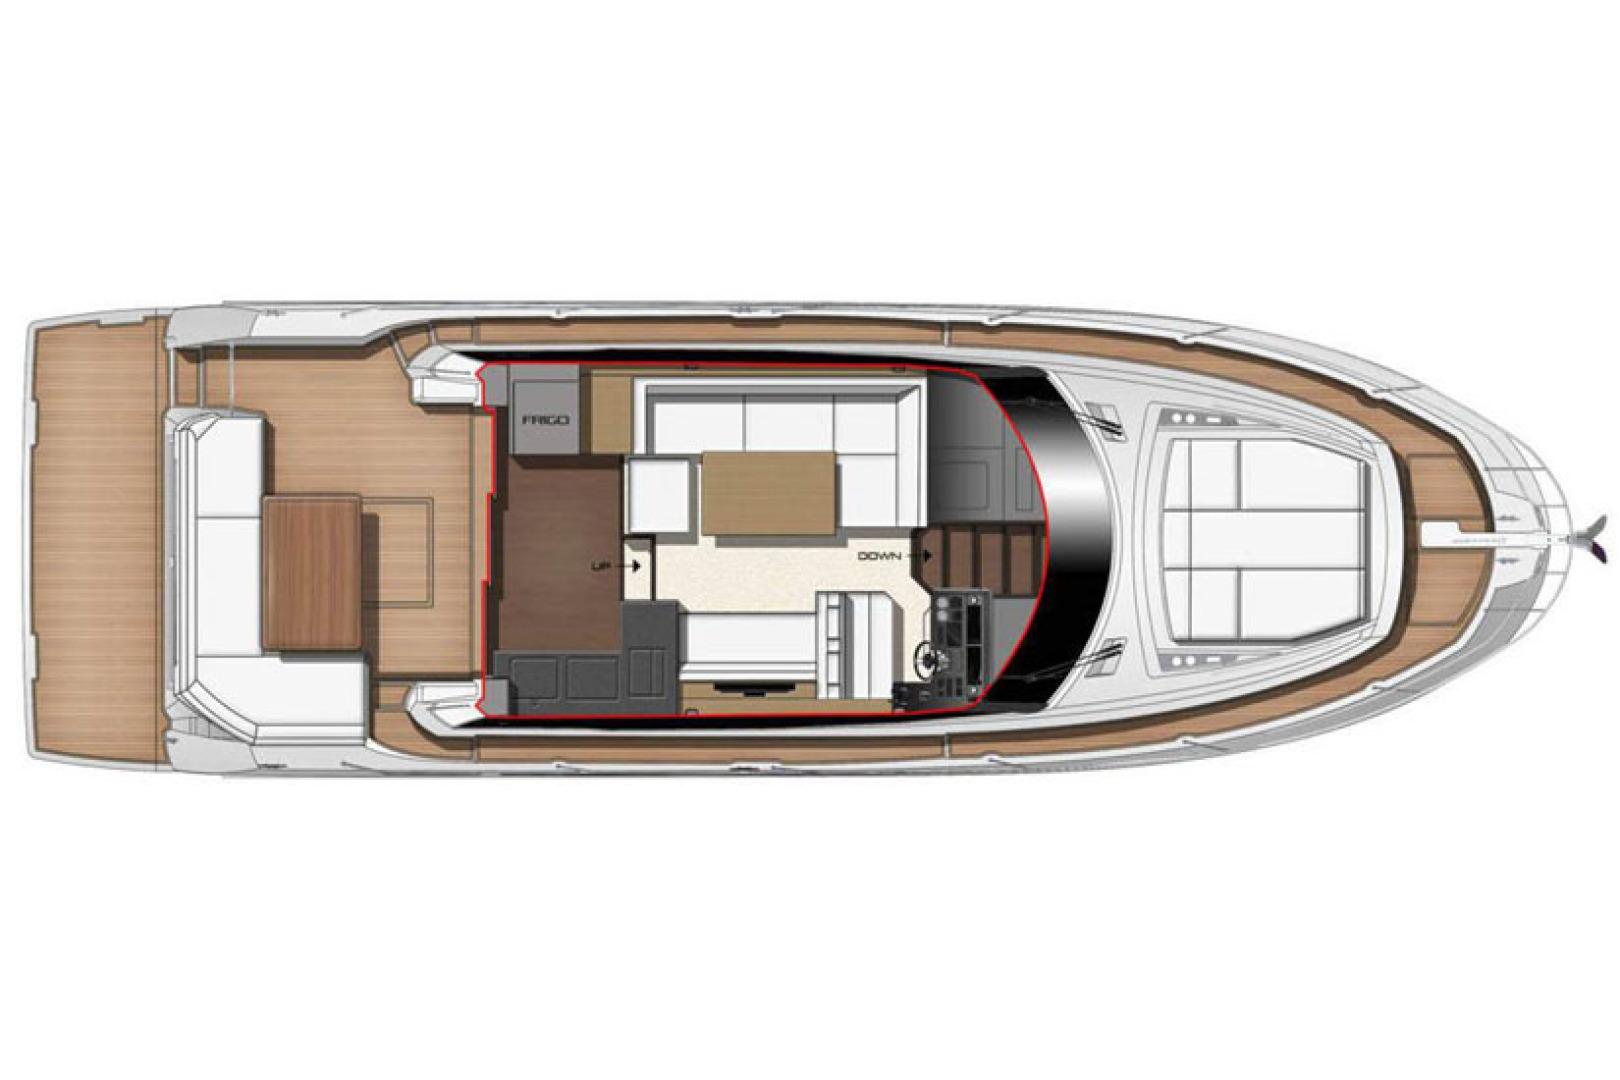 Prestige-460 S 2018-Unforgettable St Petersburg-Florida-United States-2018 Prestige 460 S Yacht  Unforgettable  Exterior Layout-1445413   Thumbnail